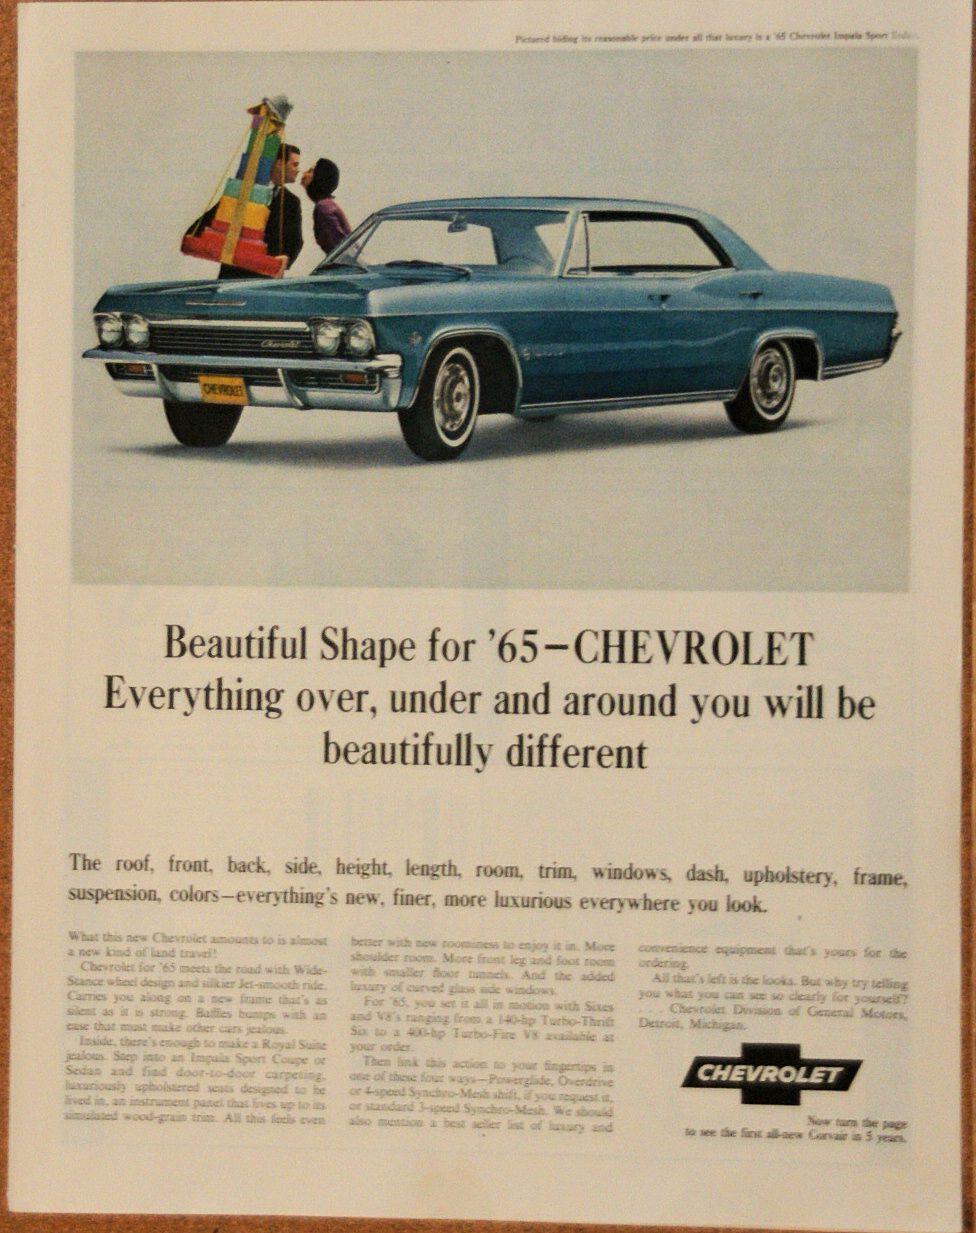 1965 Chevy Corvair Chevrolet Impala Impala Chevrolet